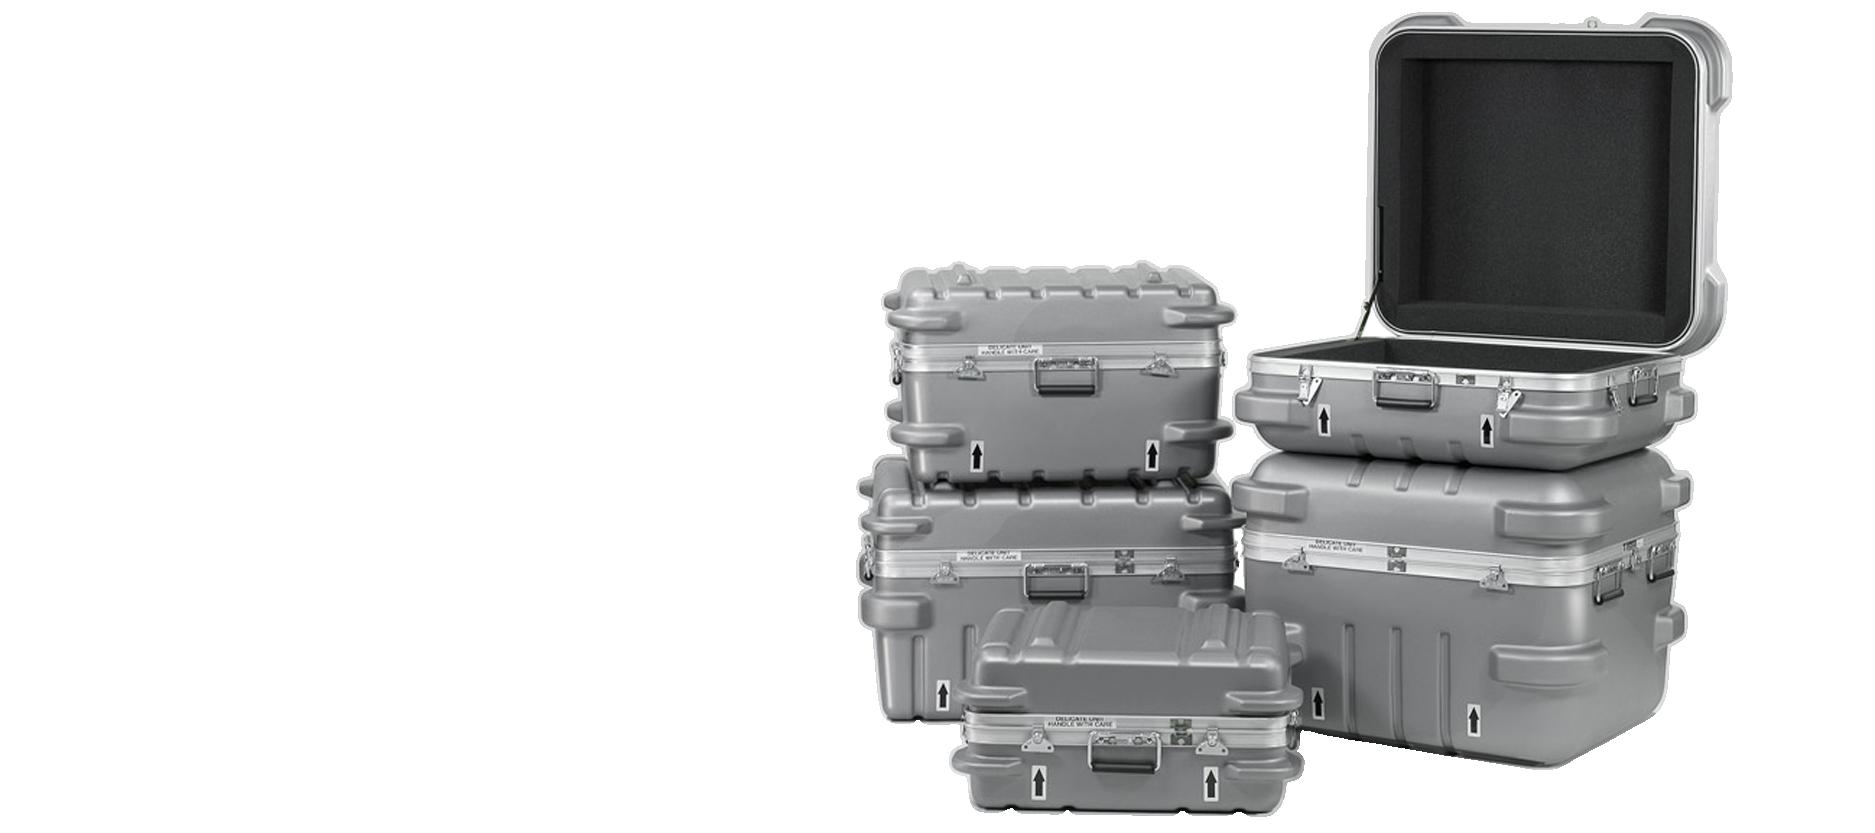 B D DigitalBanners 900x400px CasesTransparentfull